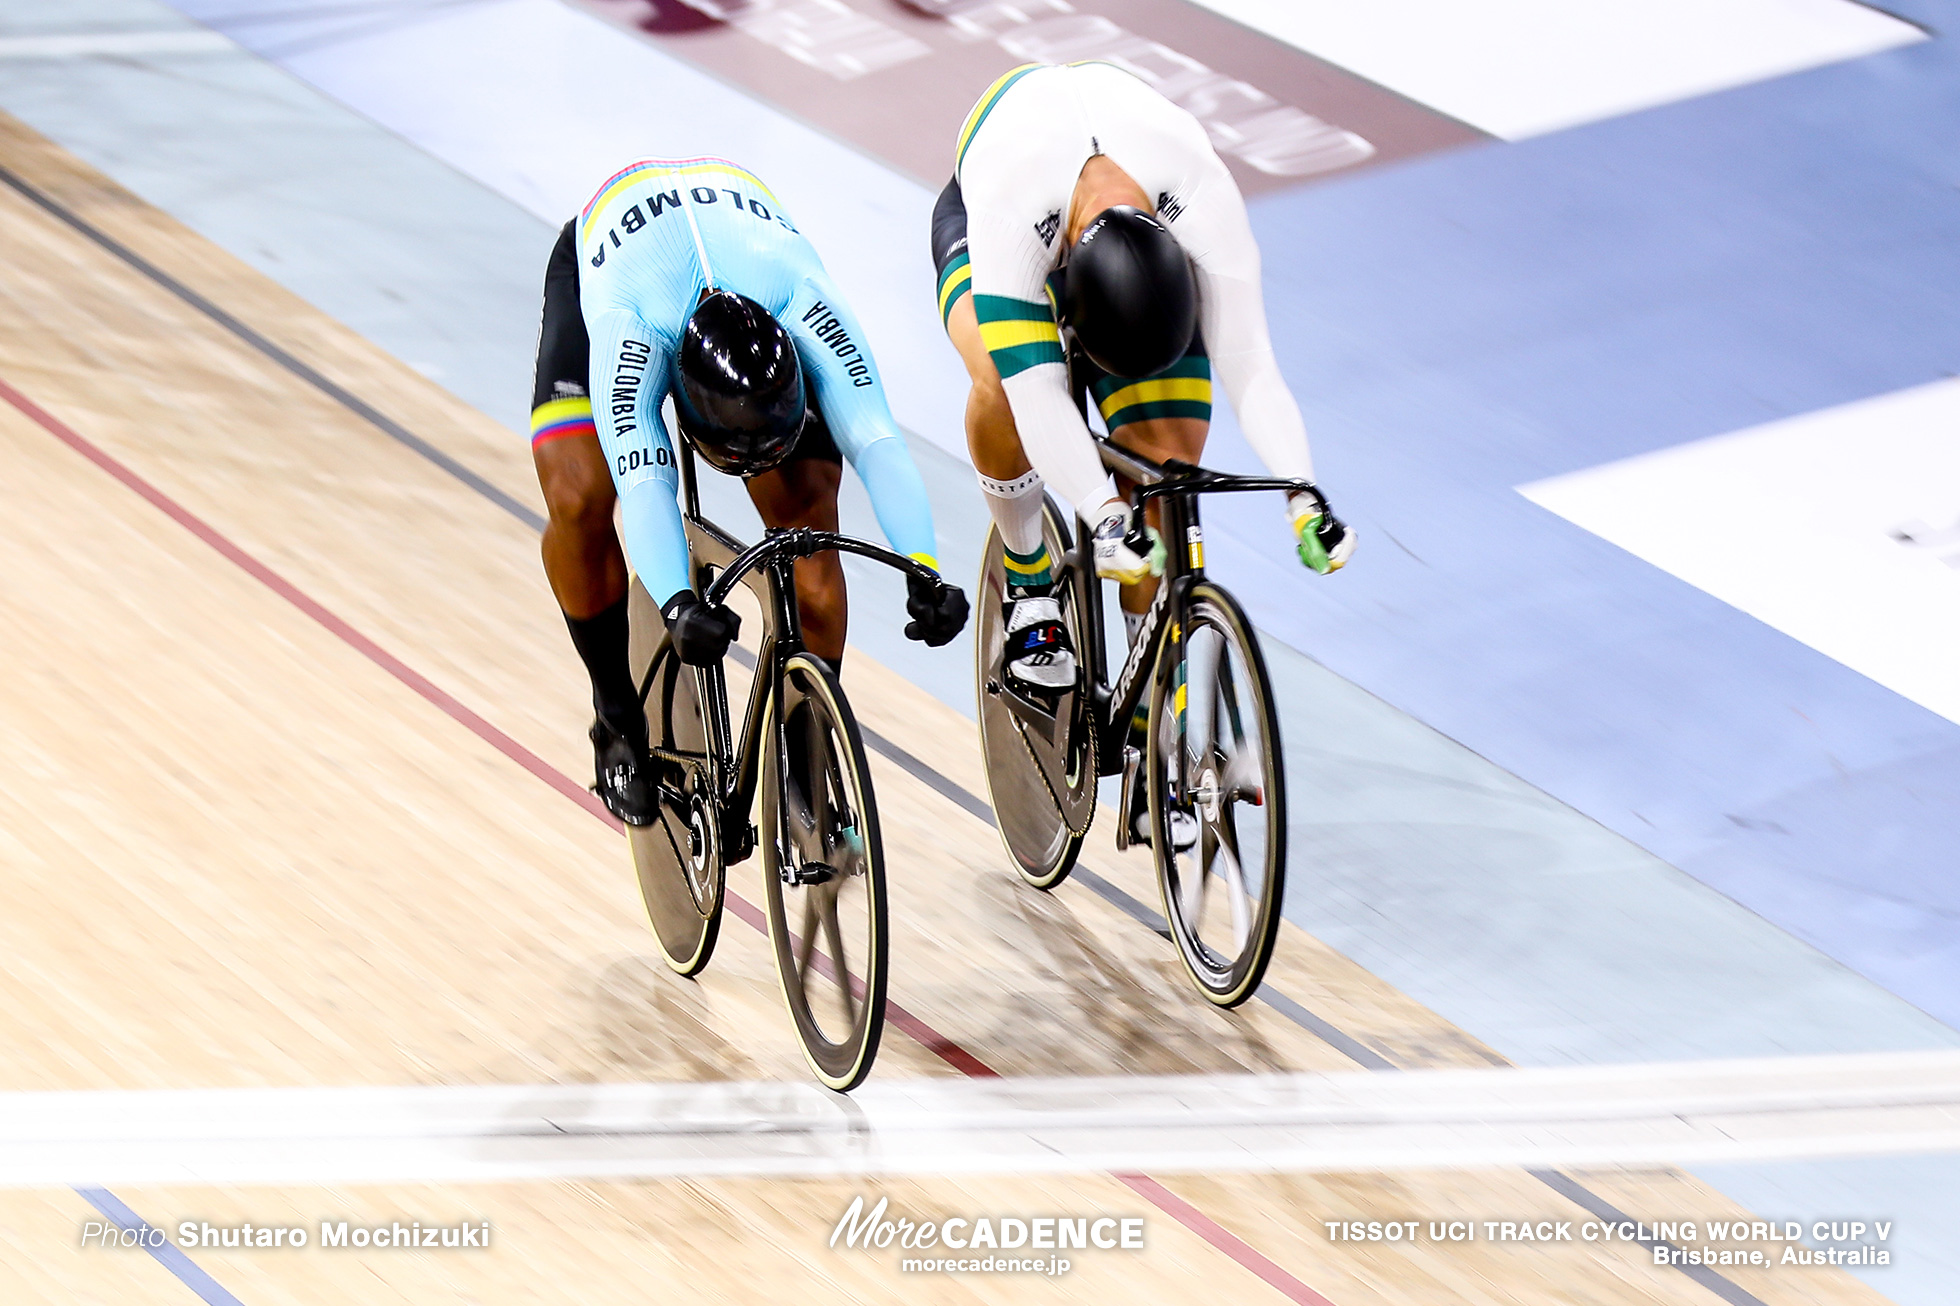 Final / Men's Keirin / TISSOT UCI TRACK CYCLING WORLD CUP V, Brisbane, Australia, Matthew GLAETZER マシュー・グレーツァー Kevin Santiago QUINTERO CHAVARRO ケビン・キンテロ